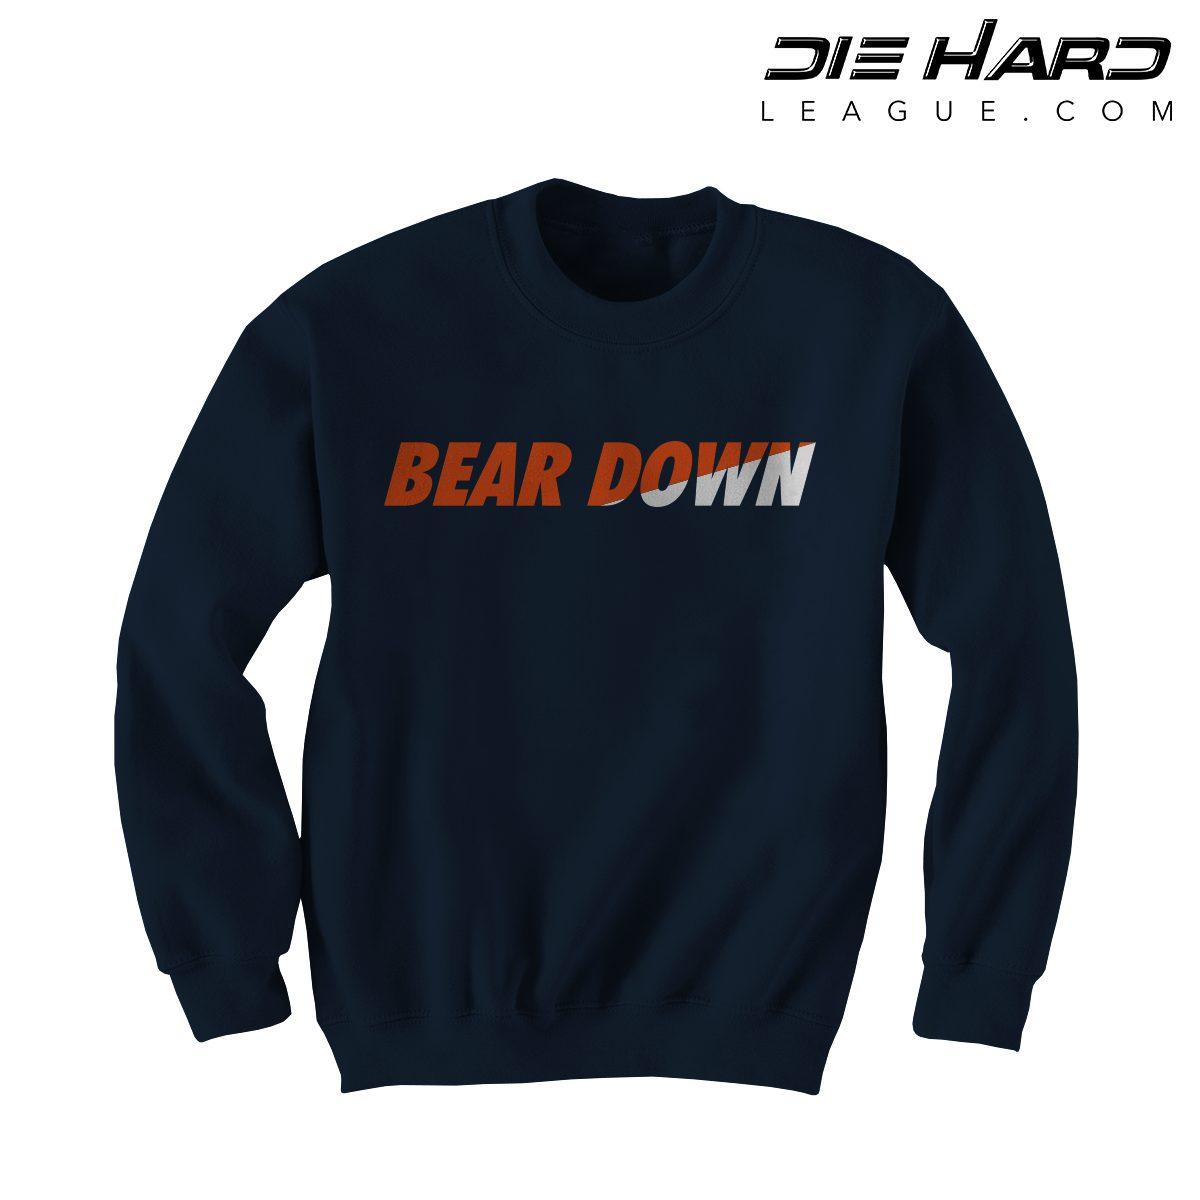 Bears Sweatshirt Chicago - Bear Down Navy Crewneck [Best Price]